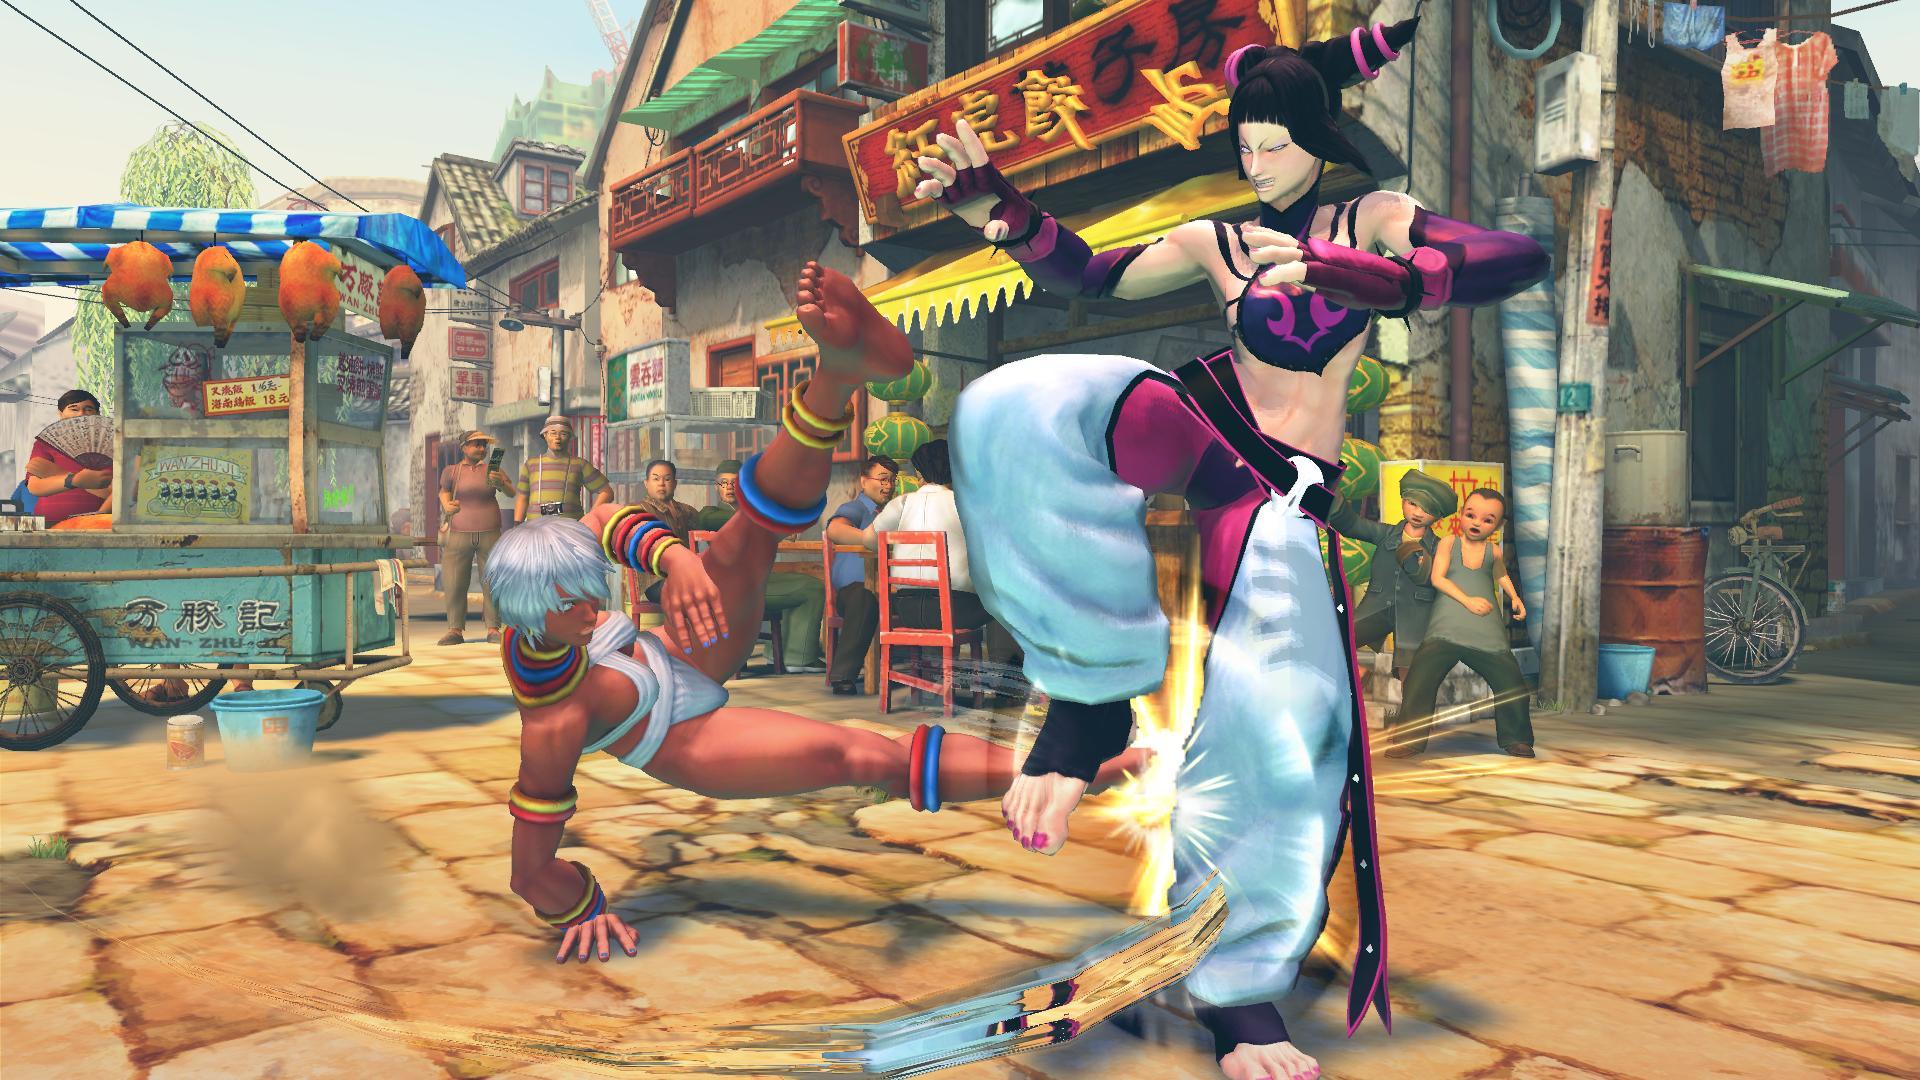 street fighter games - HD1500×844